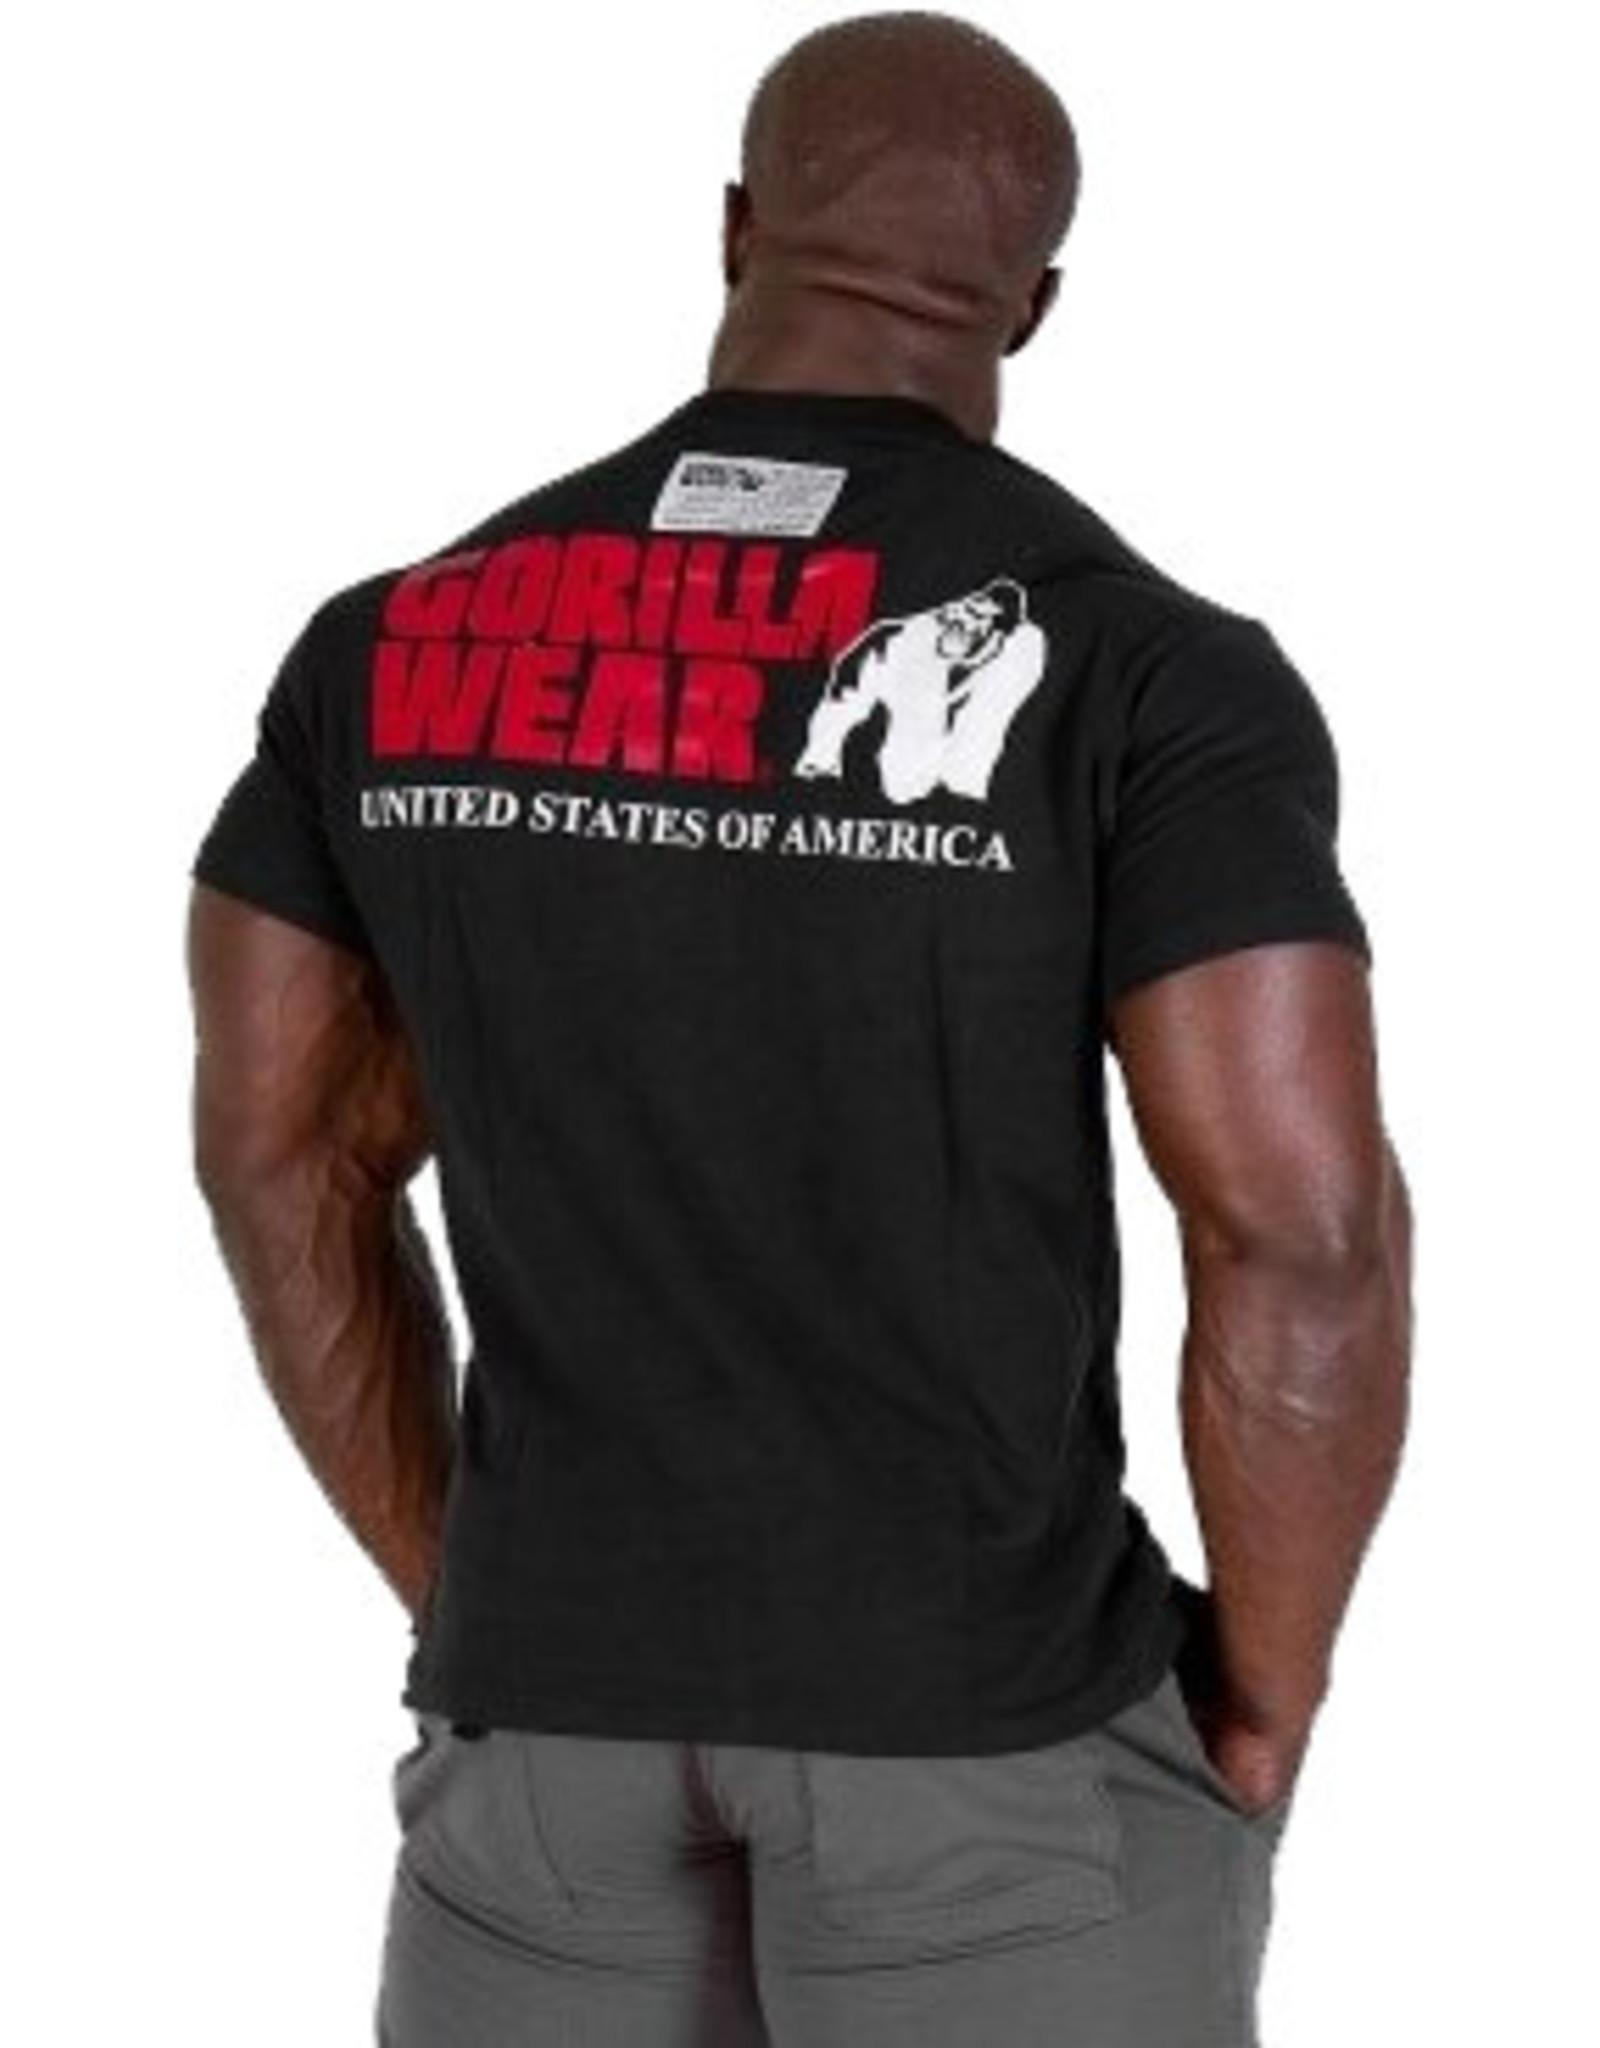 Gorilla Wear Classic Logo Tee New Style - Black